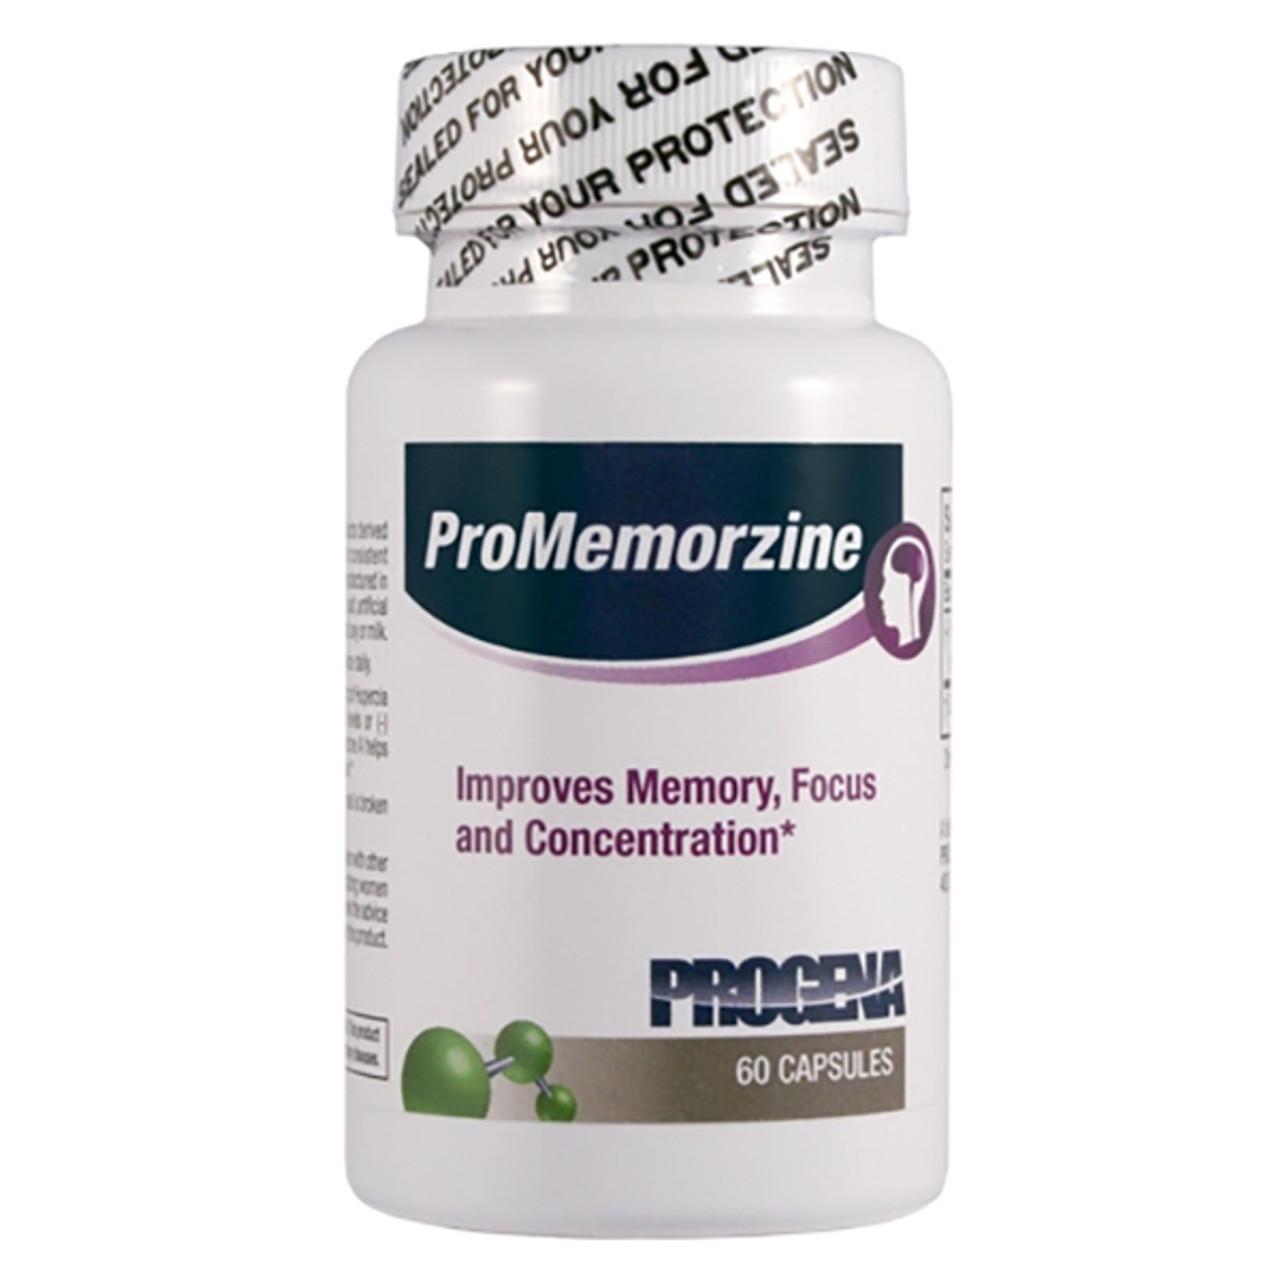 Pro Memorzine (Hupezine A)  60 caps (50 mcg)